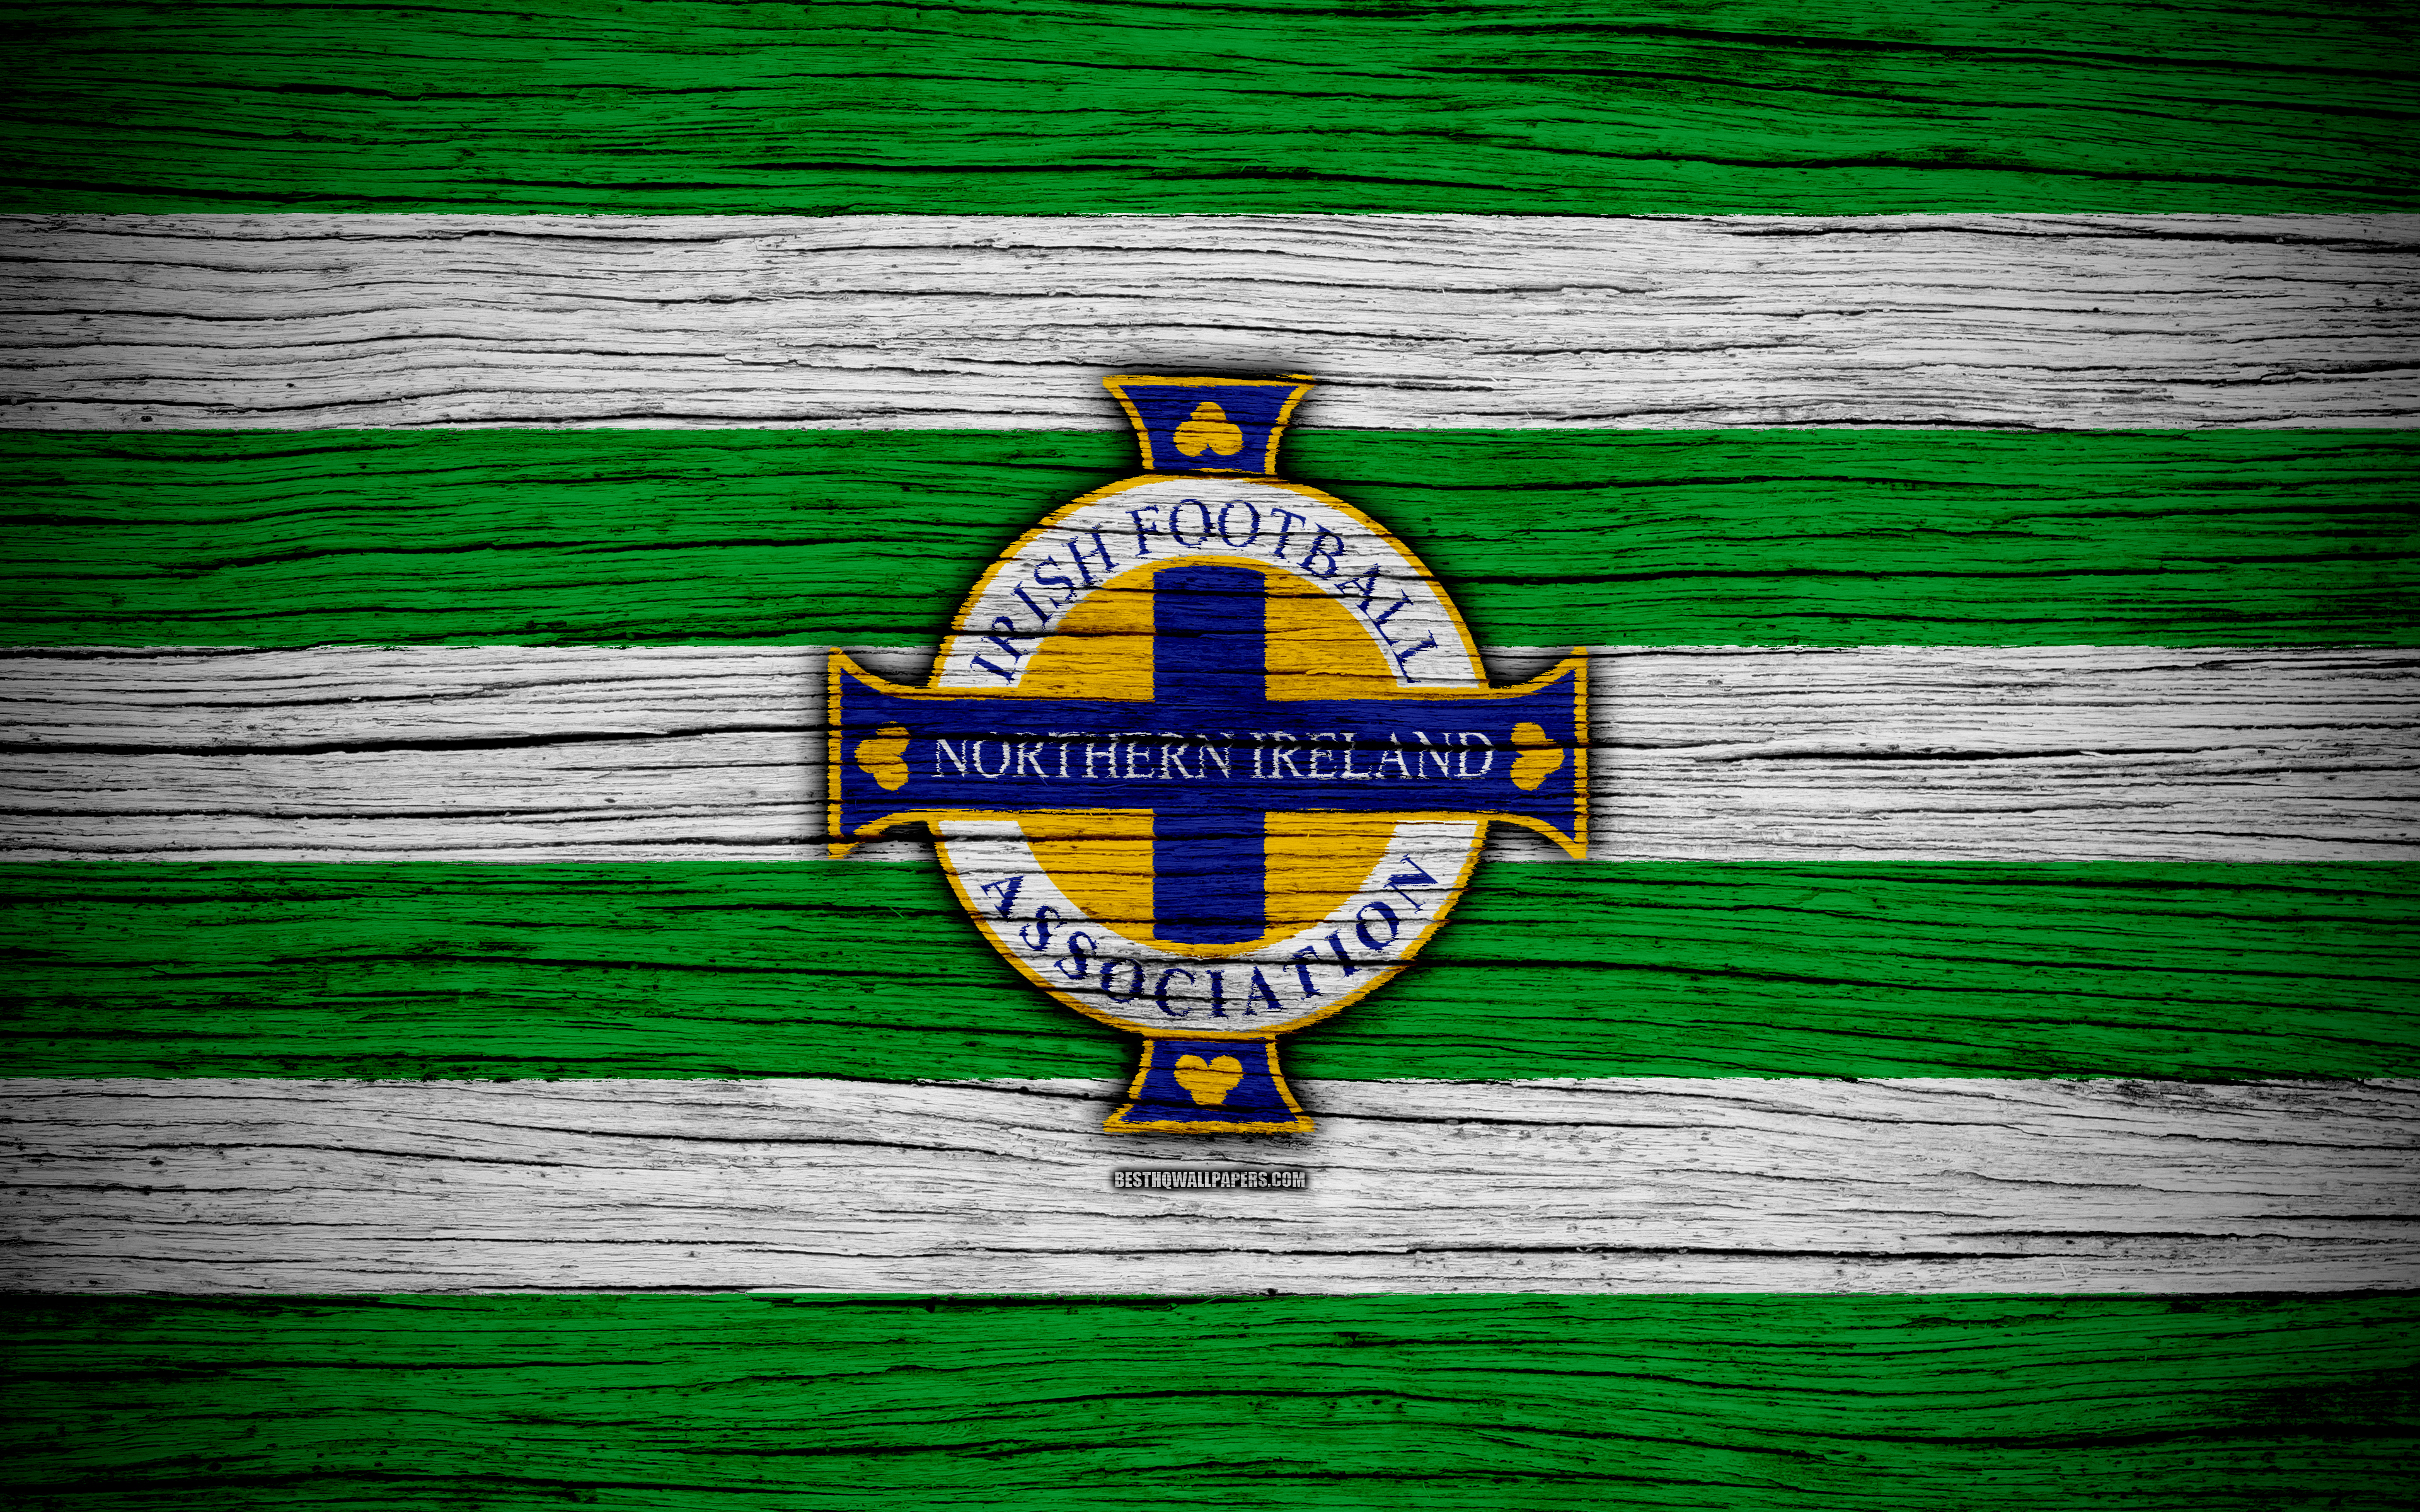 Download wallpapers 4k Northern Ireland national football team 3840x2400